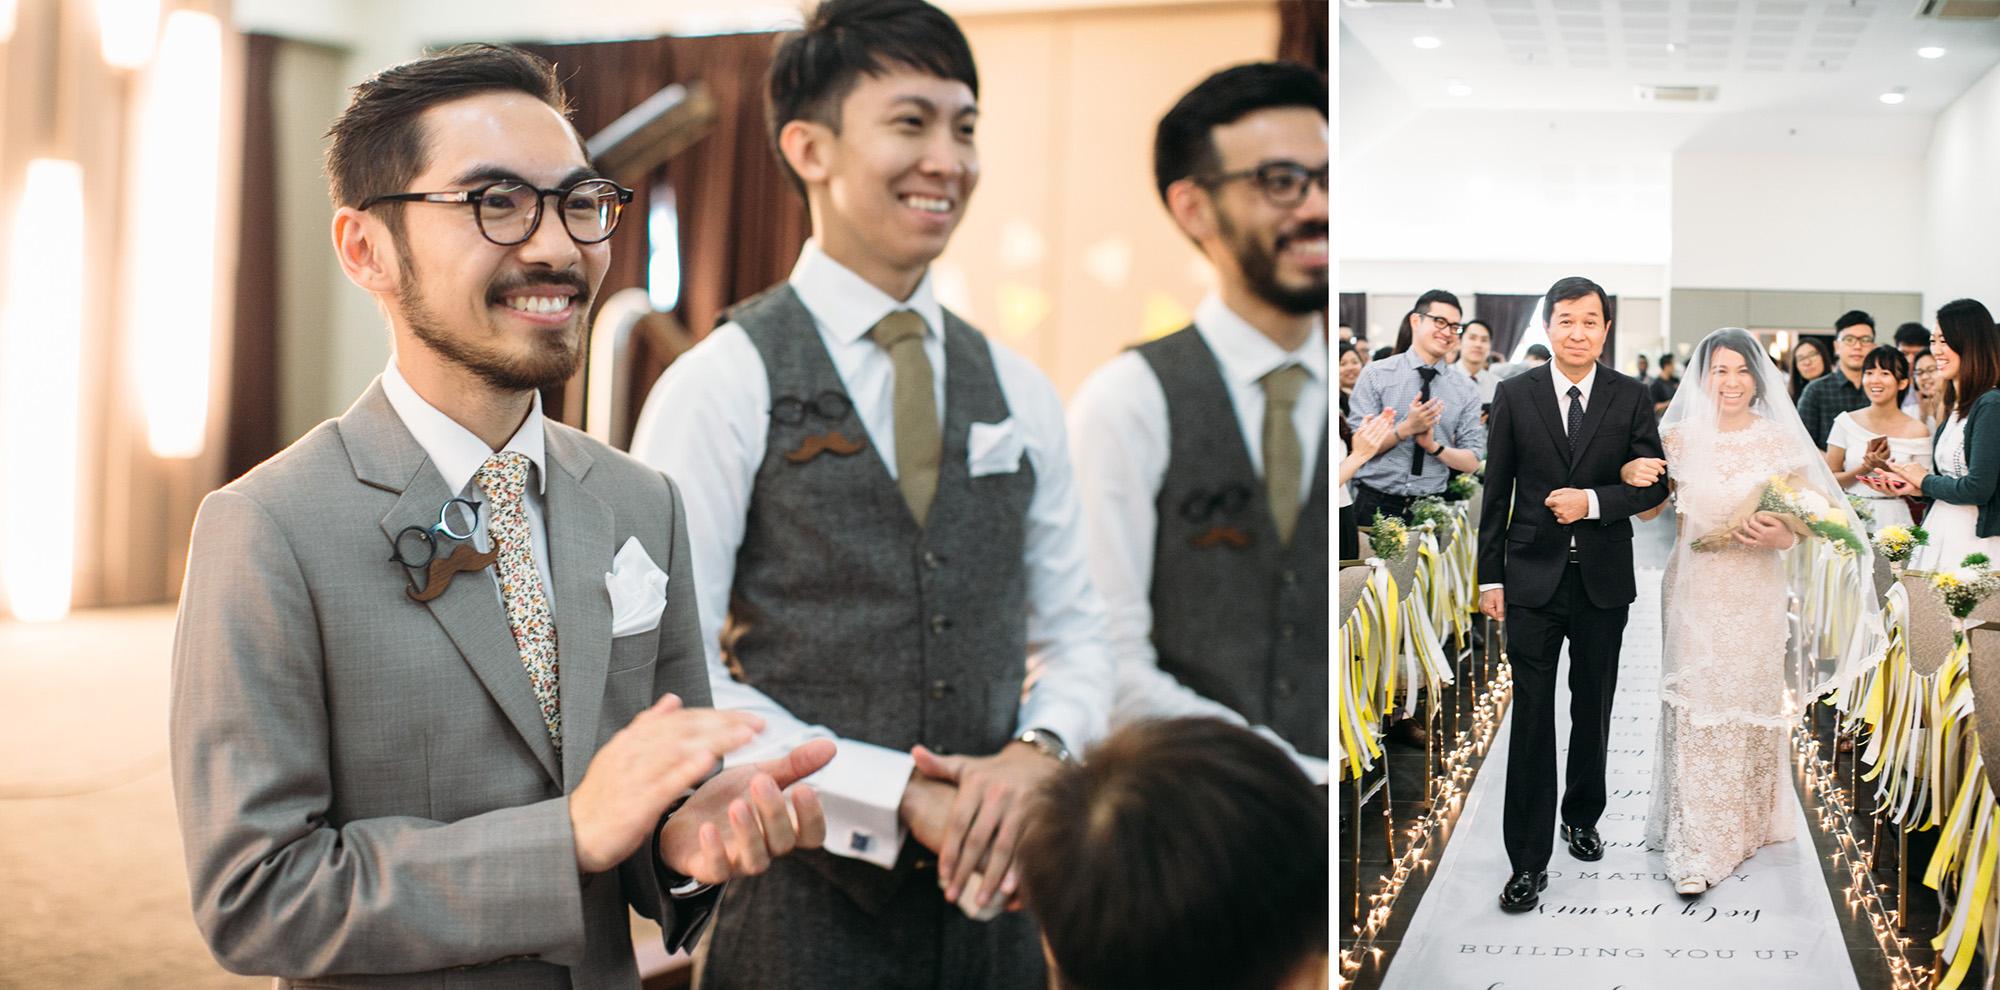 47-hellojanelee-sam grace-malaysia-wedding-day